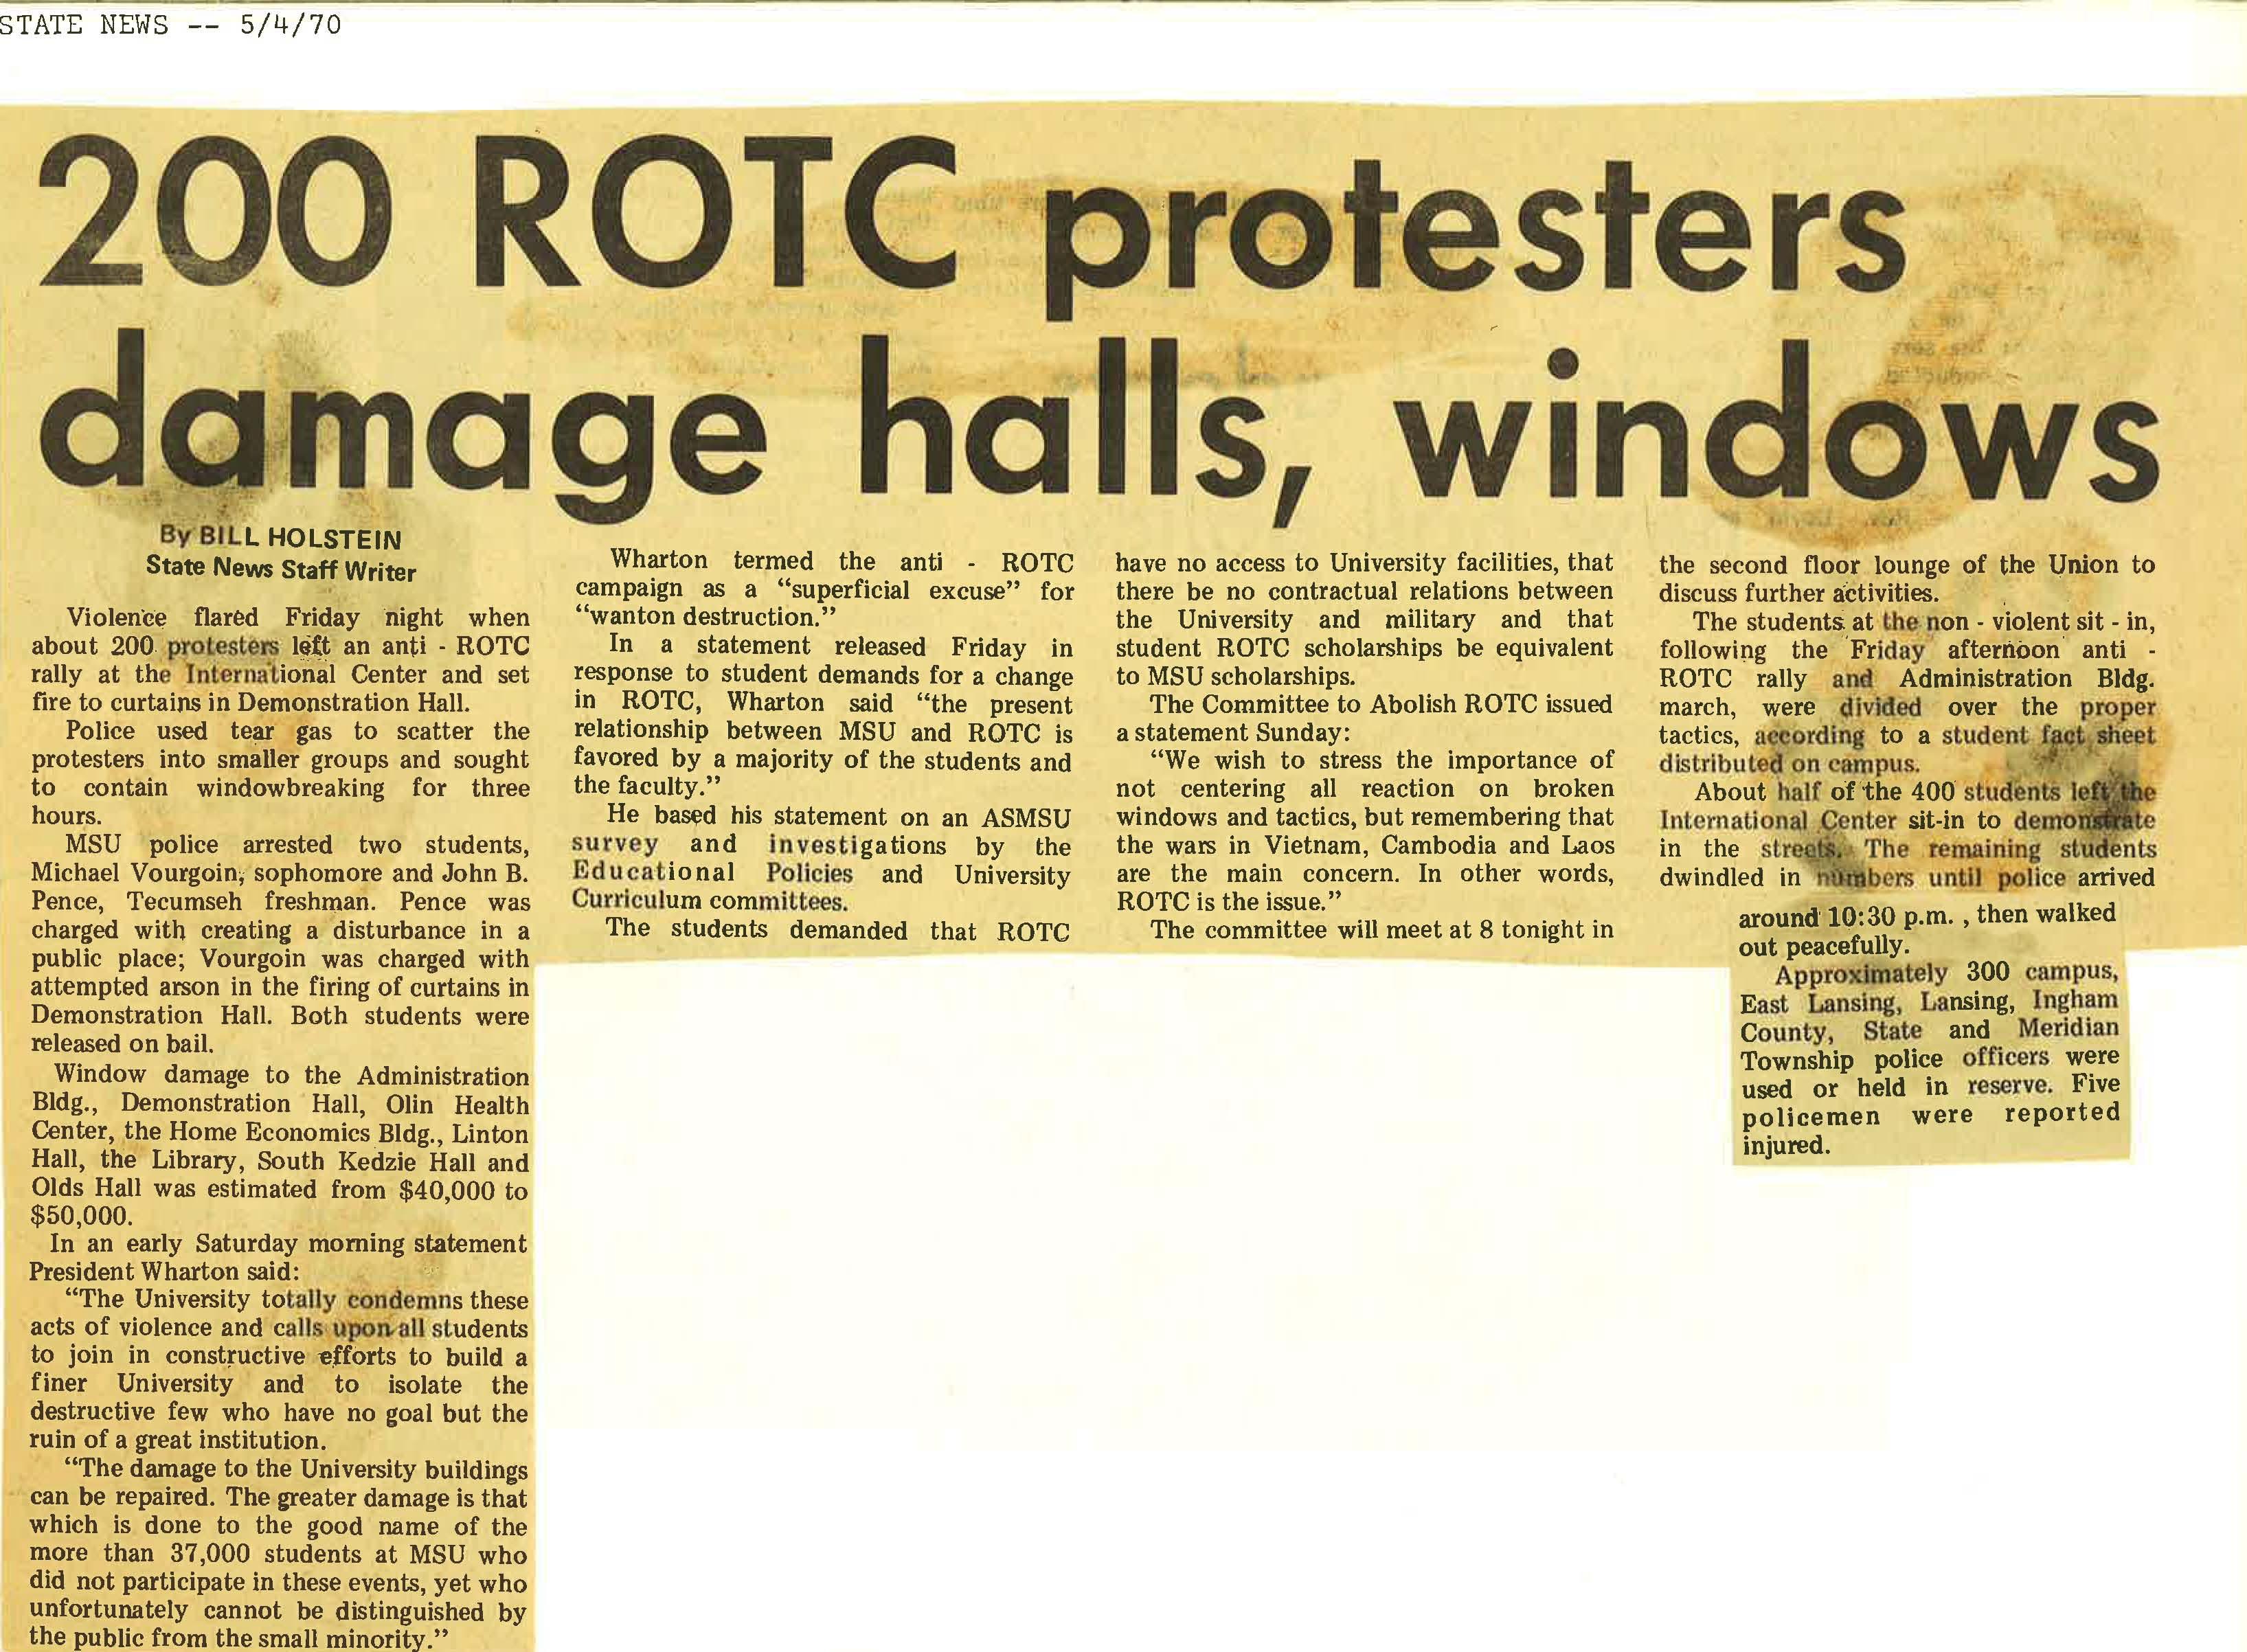 Anti-ROTC Vandalism